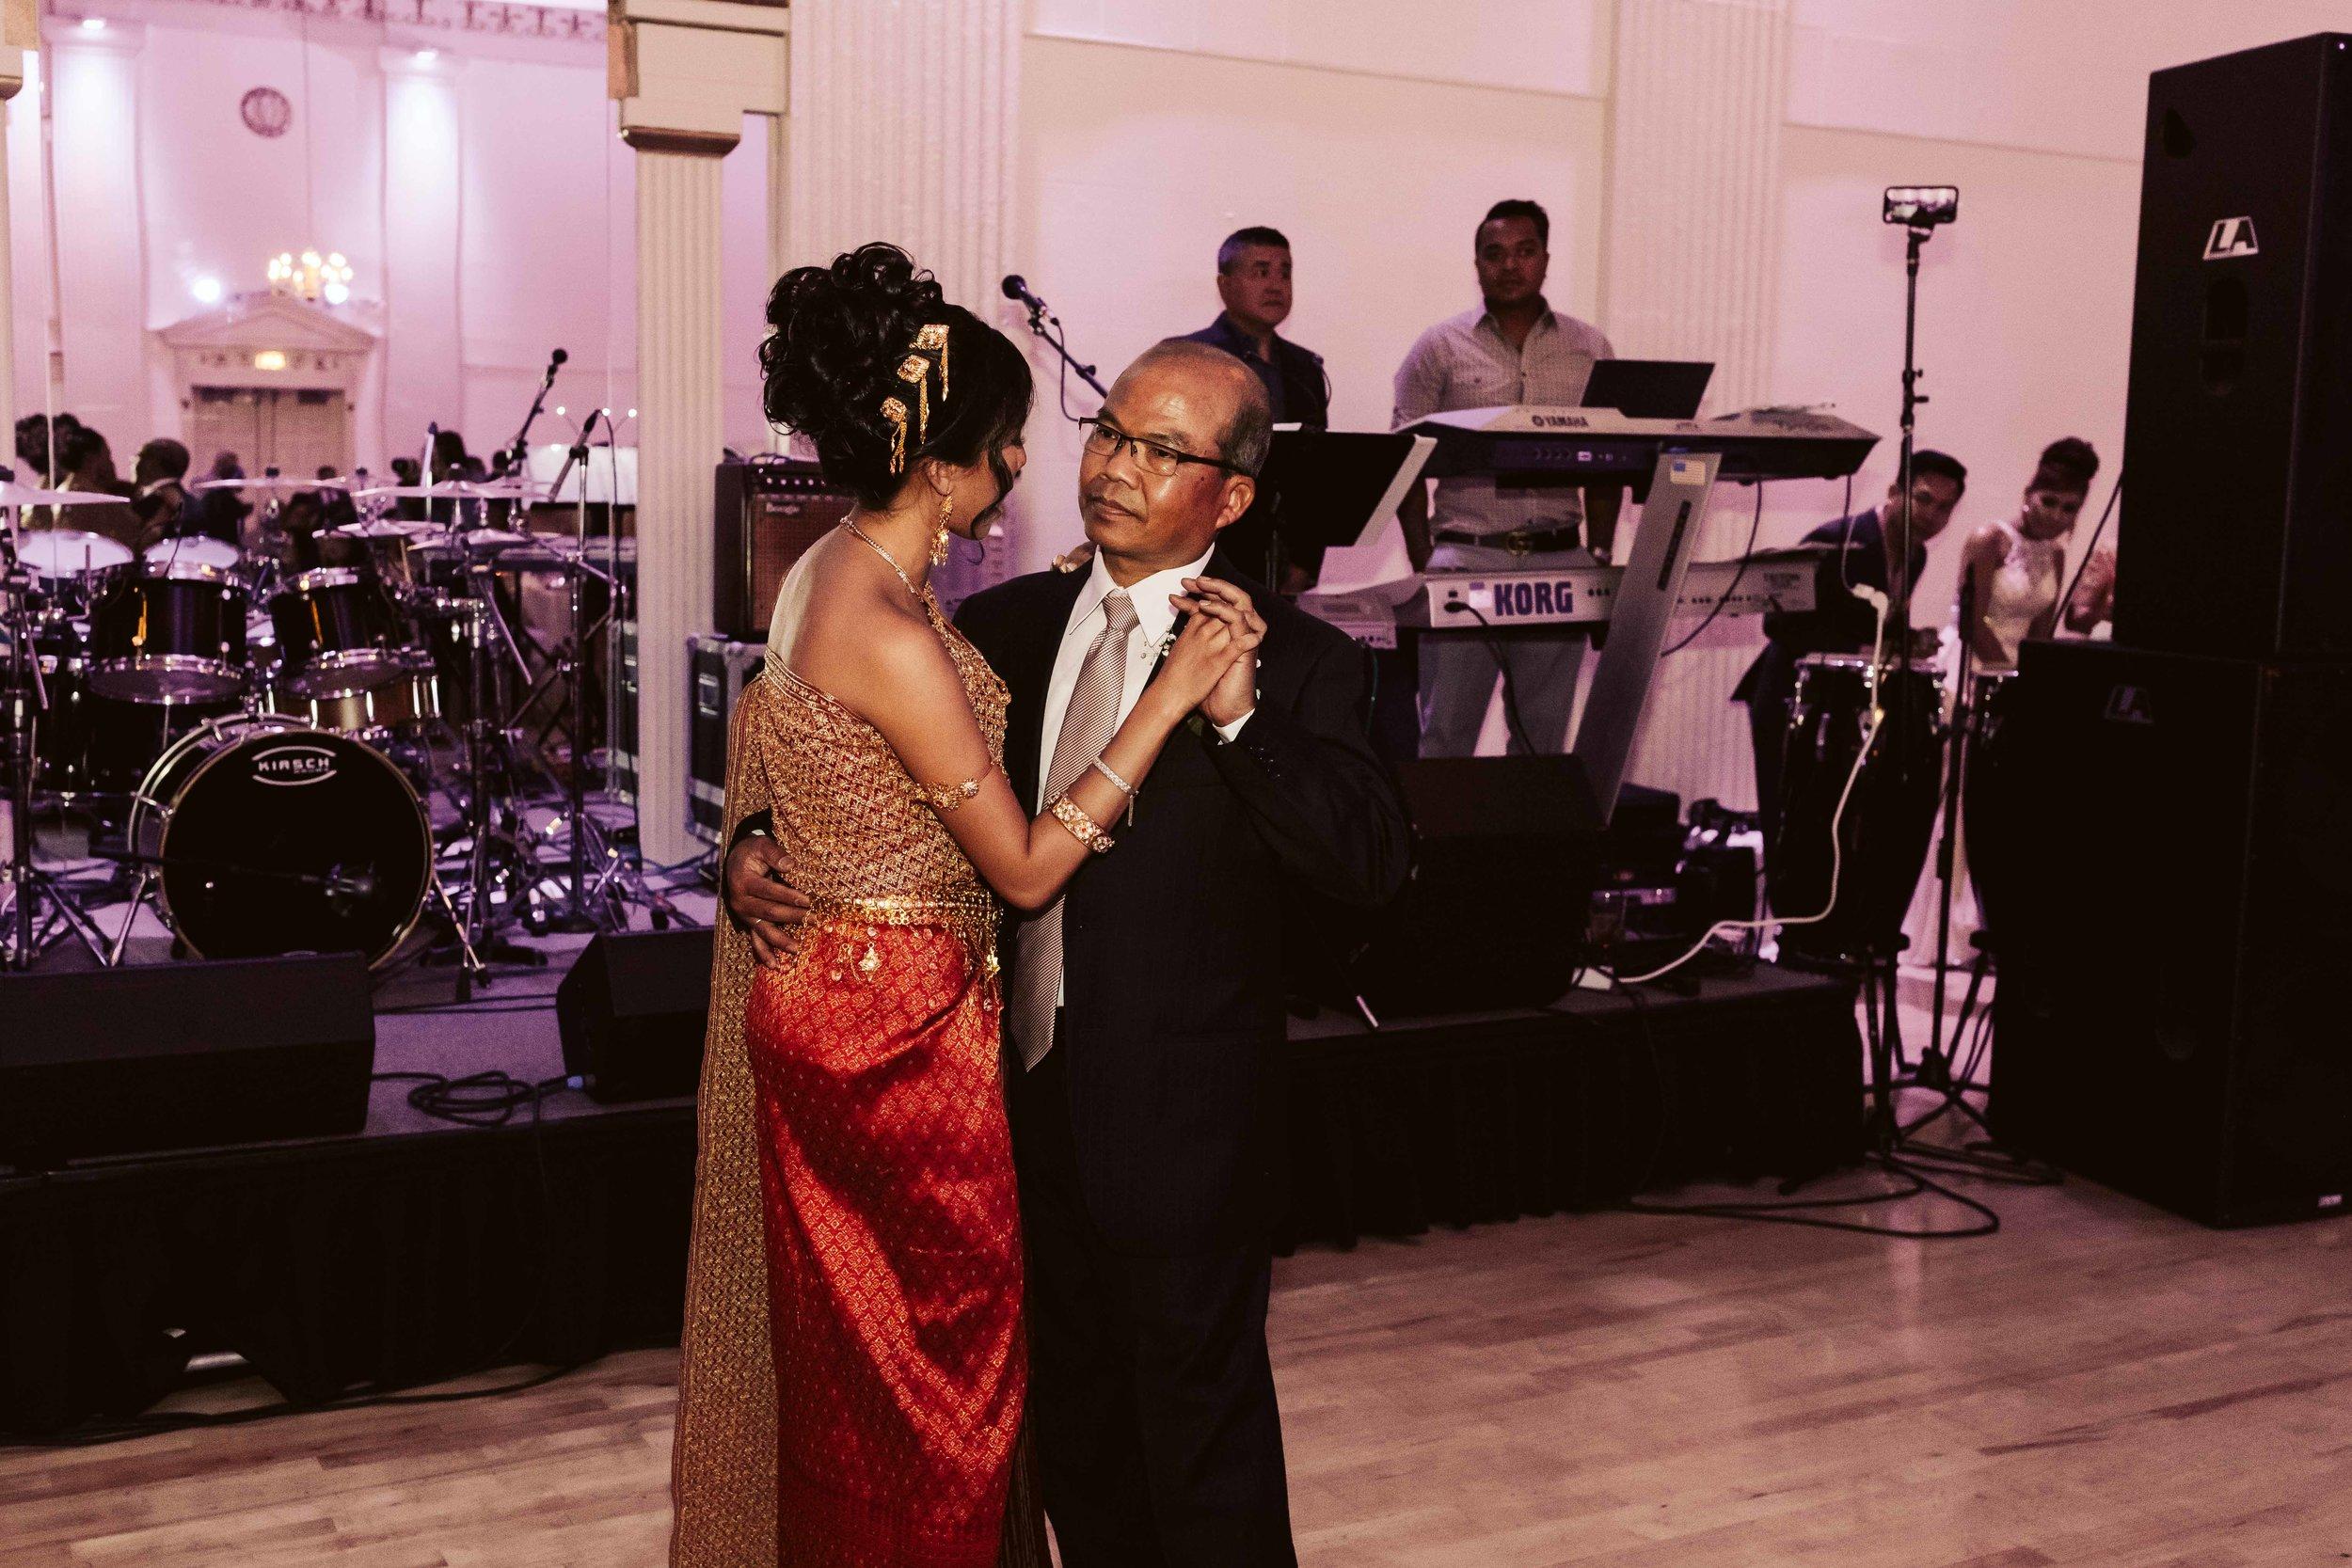 melody-ballroom-portland-wedding-106.jpg